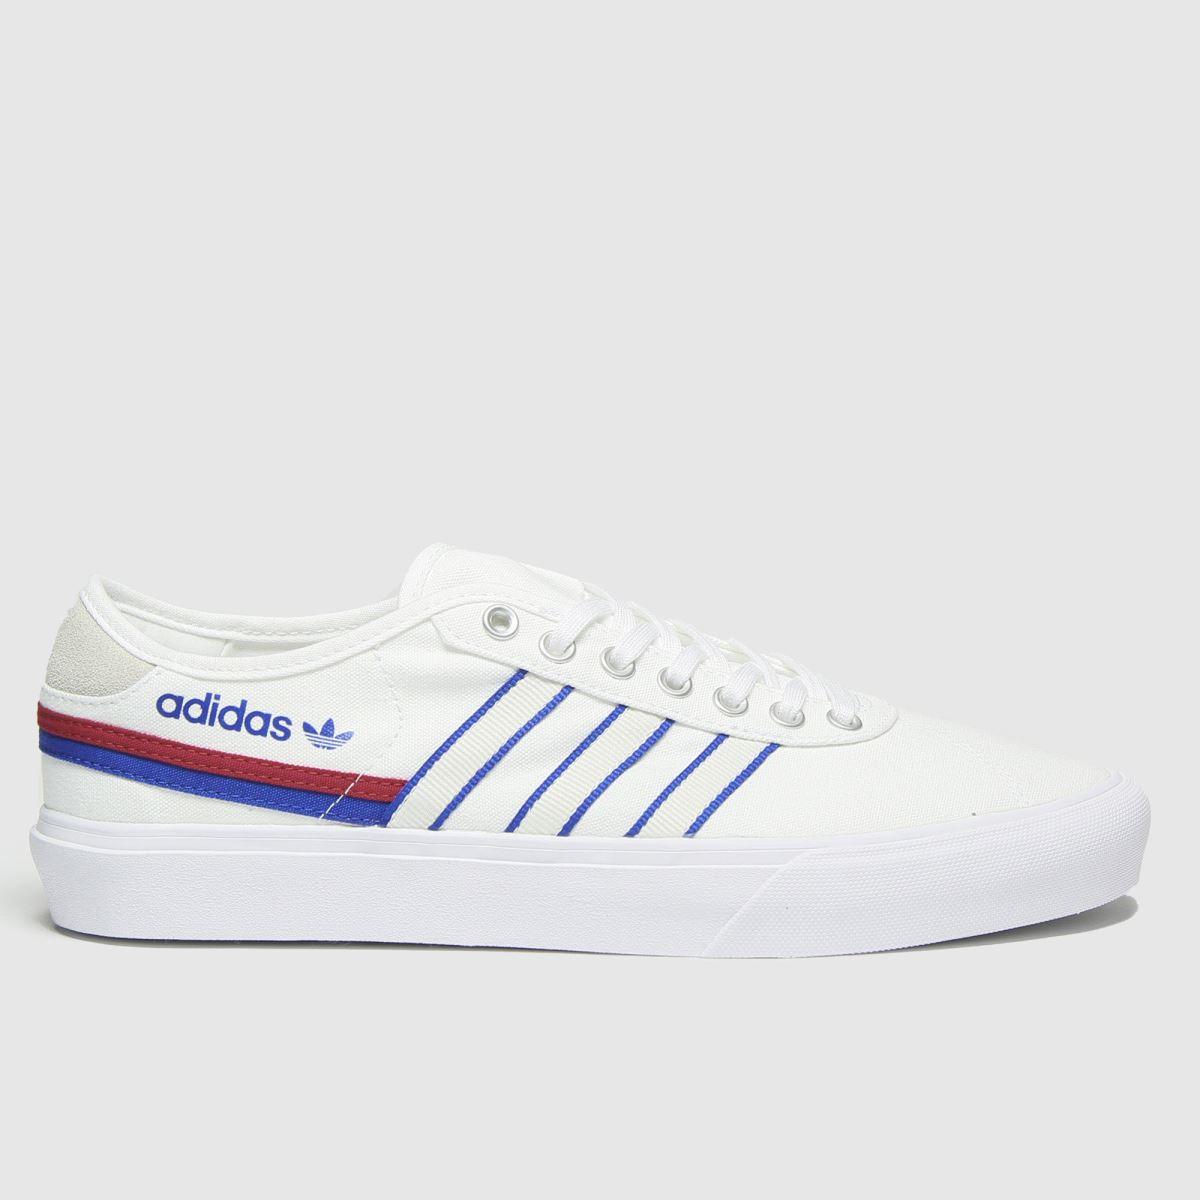 Adidas White & Blue Delpala Trainers